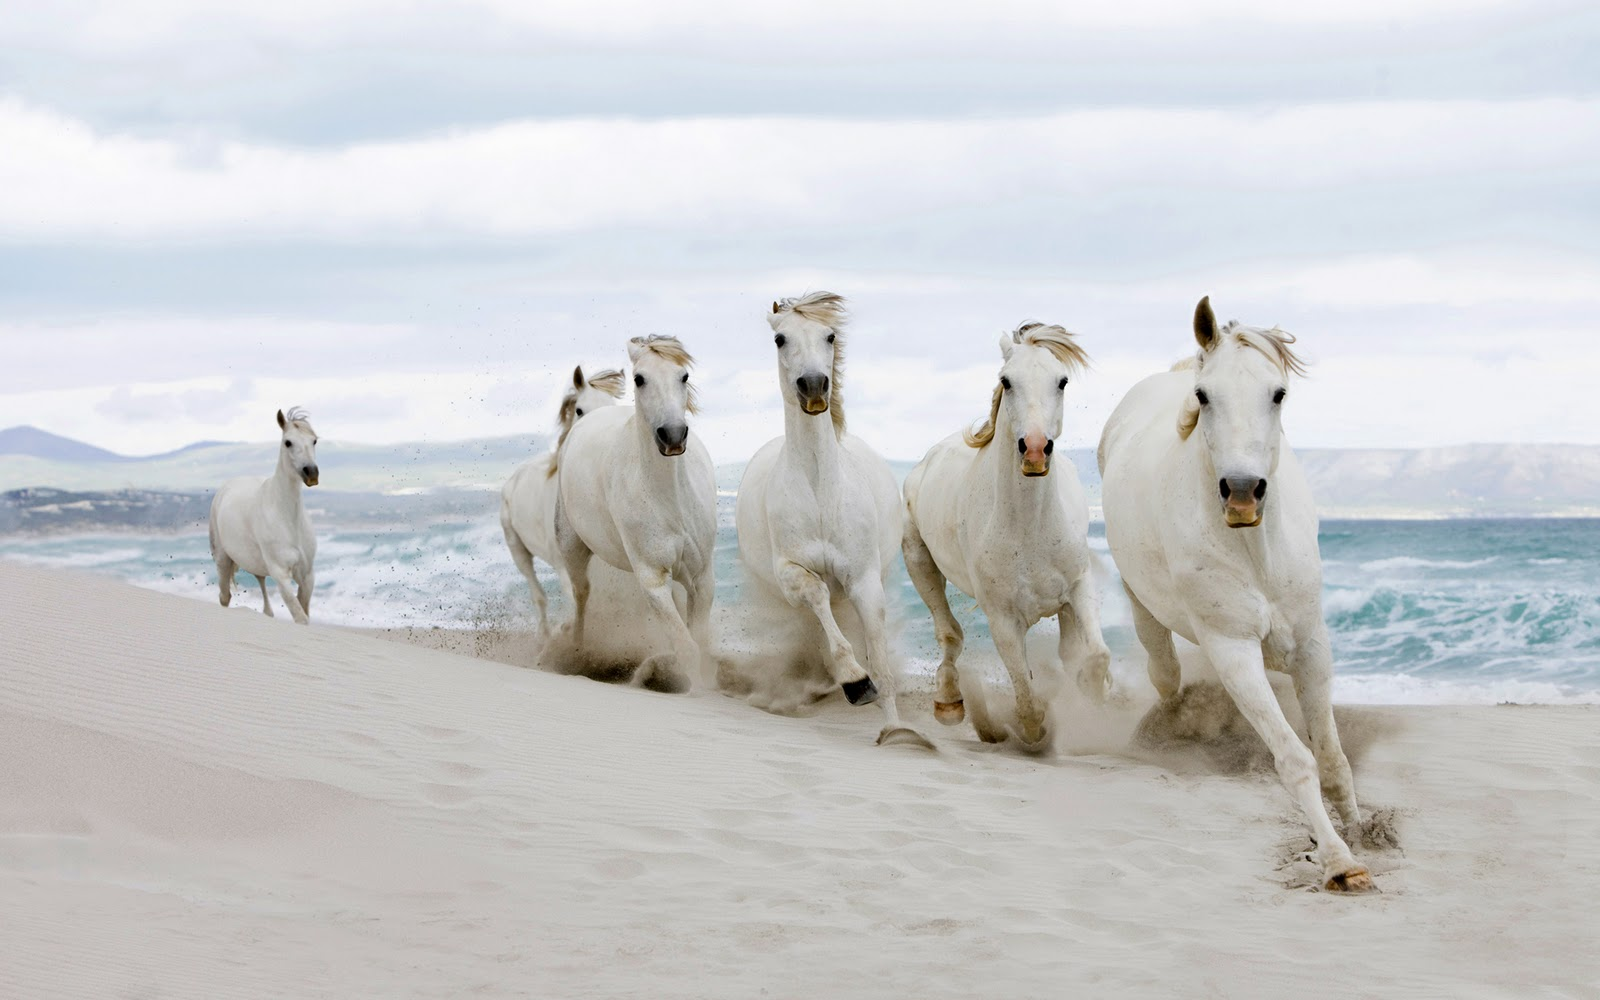 Sfondi desktop hd cavalli bianchi sfondi hd gratis for Sfondi cavalli gratis